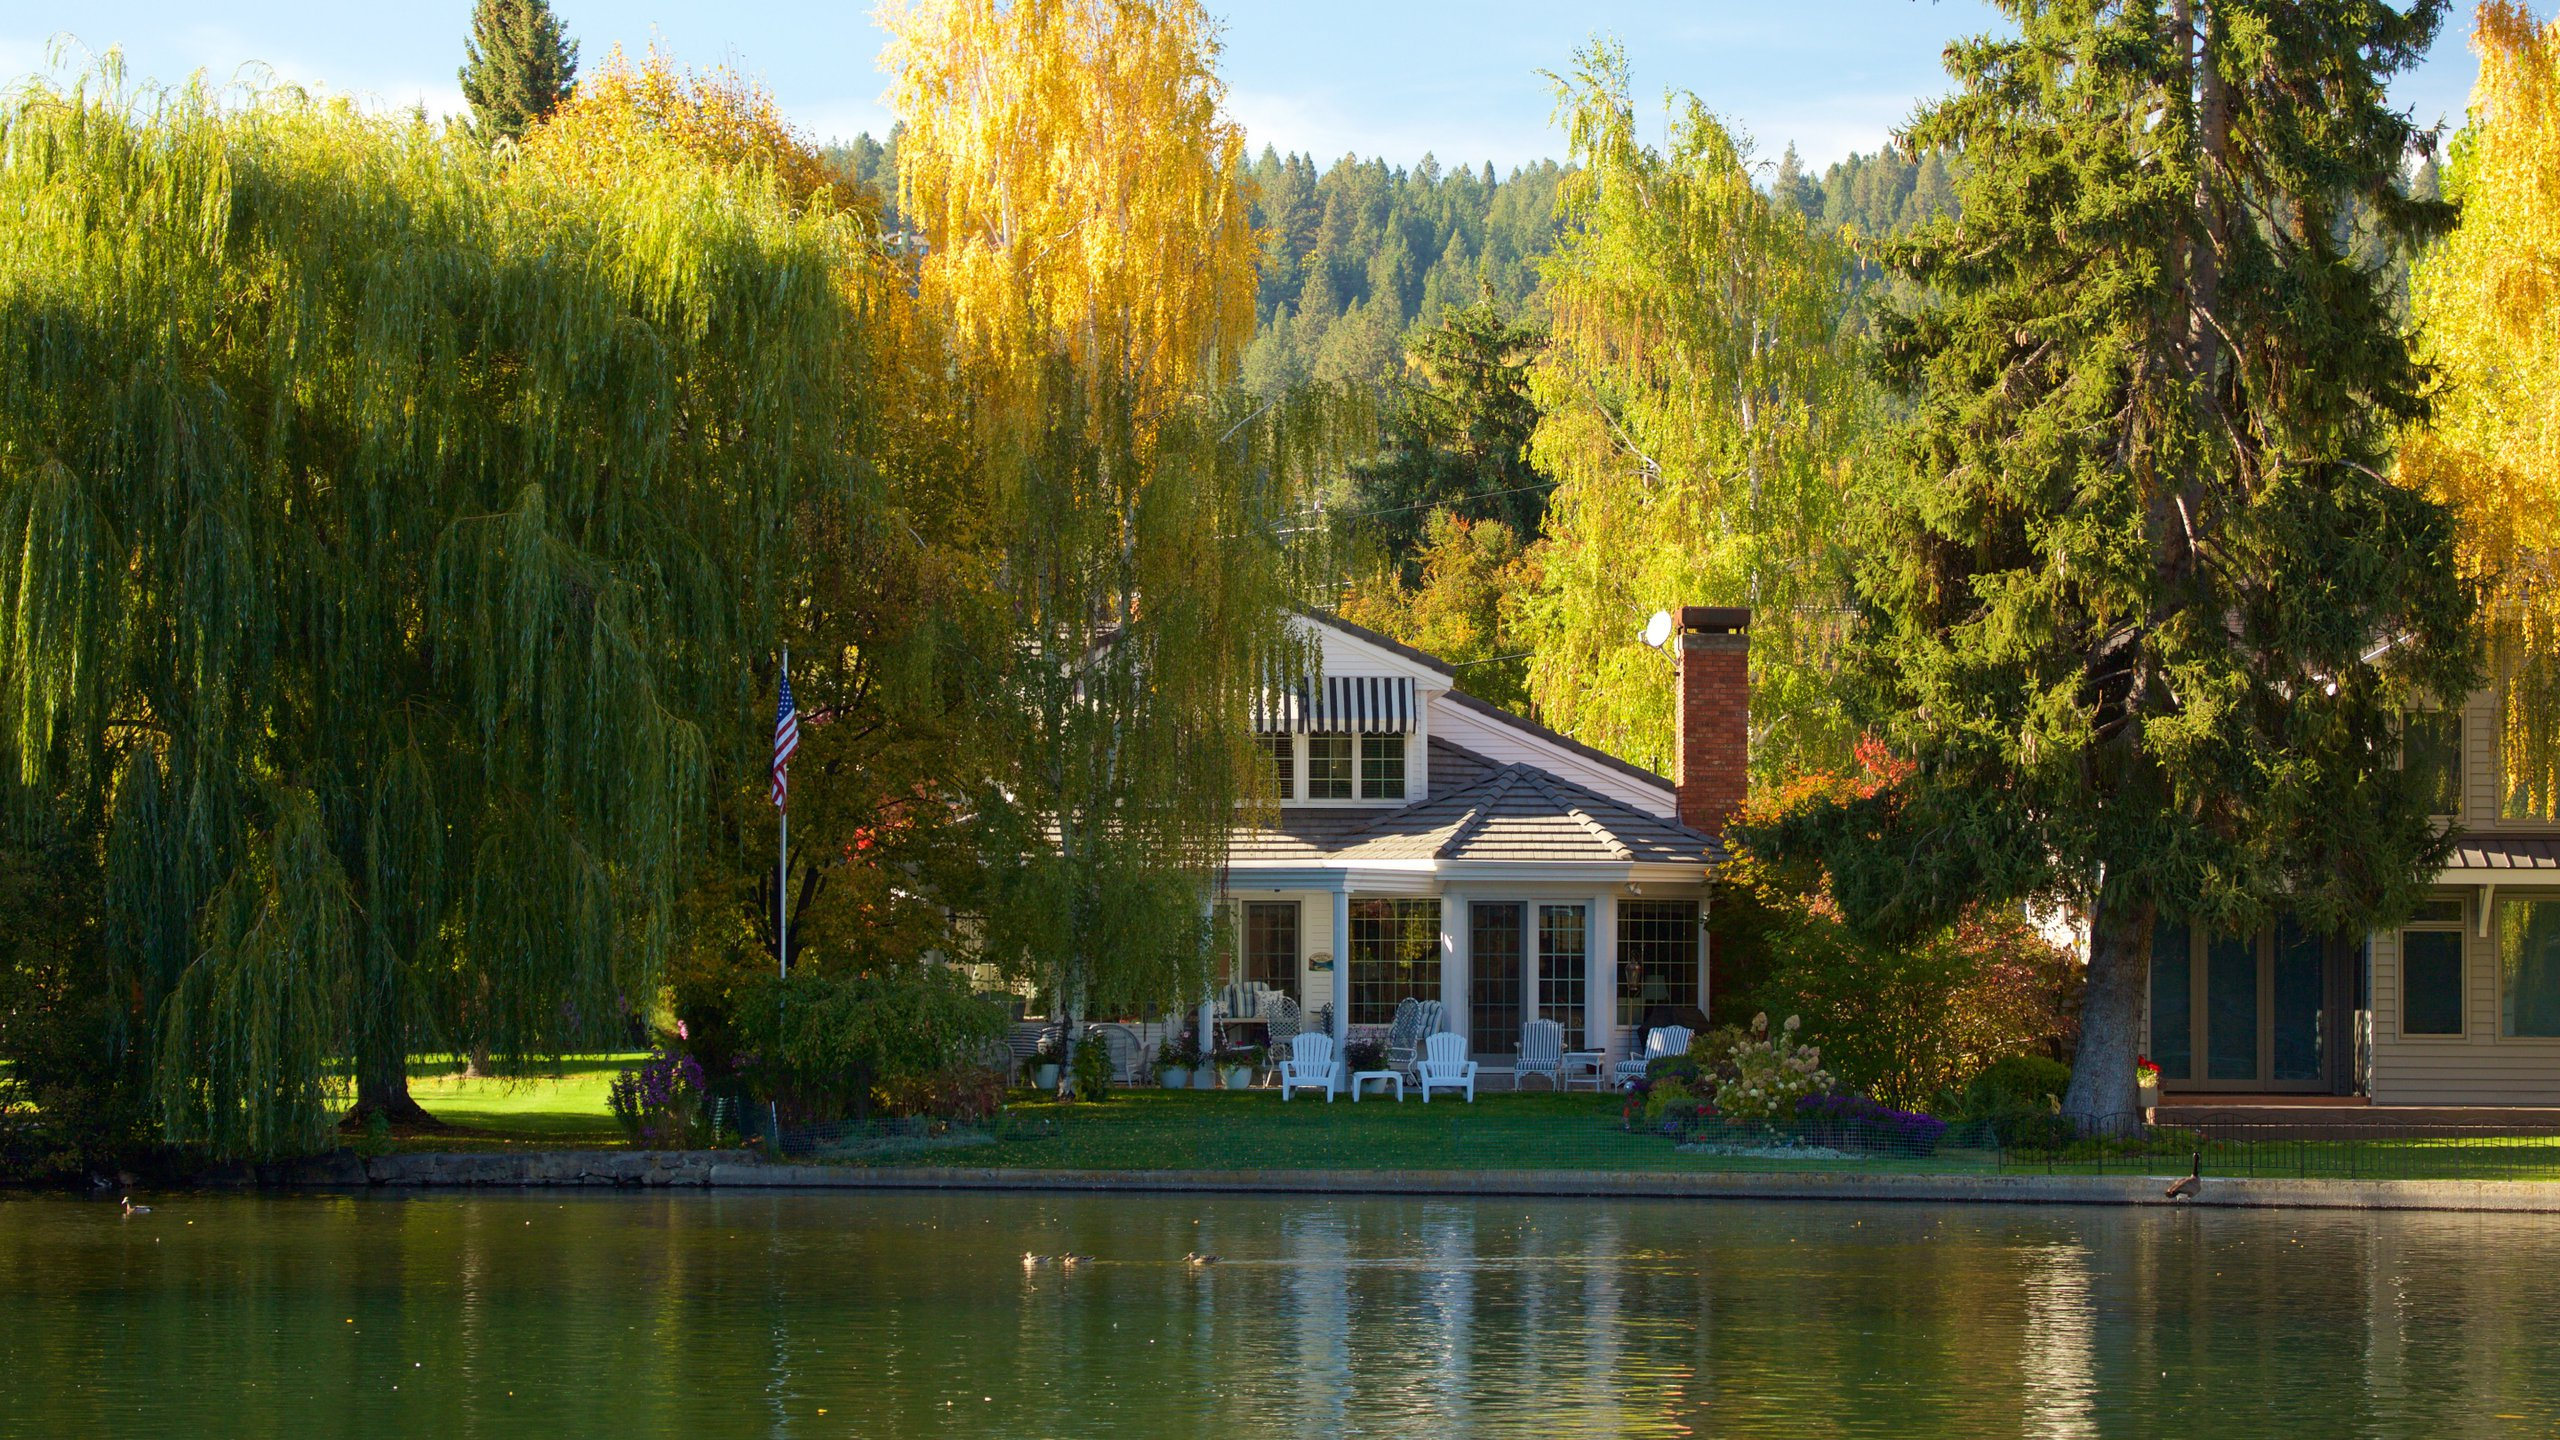 Drake Park, Bend, Oregon, United States of America